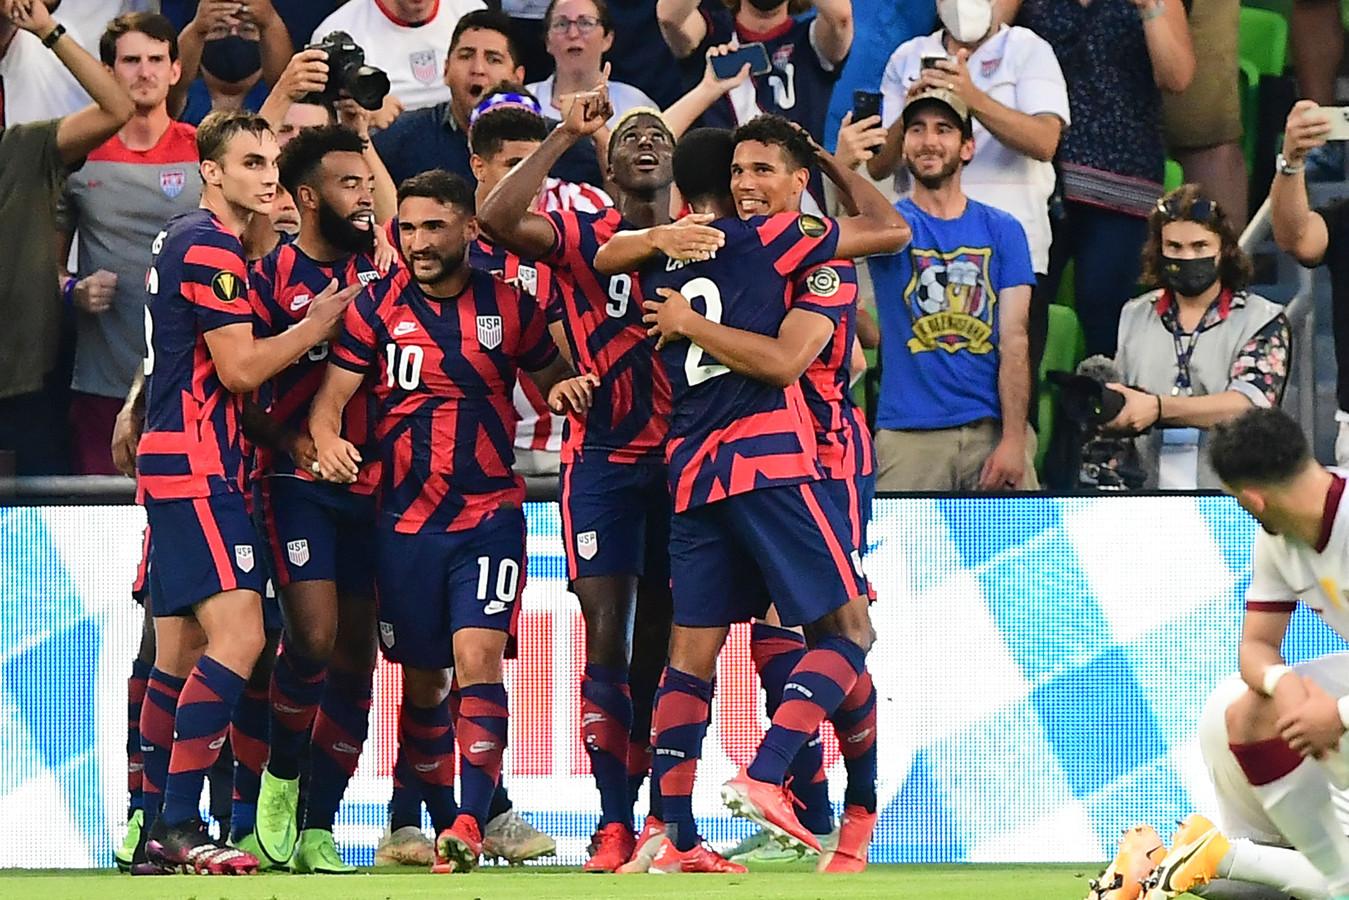 De Amerikaanse voetballers rekenen af met Qatar.